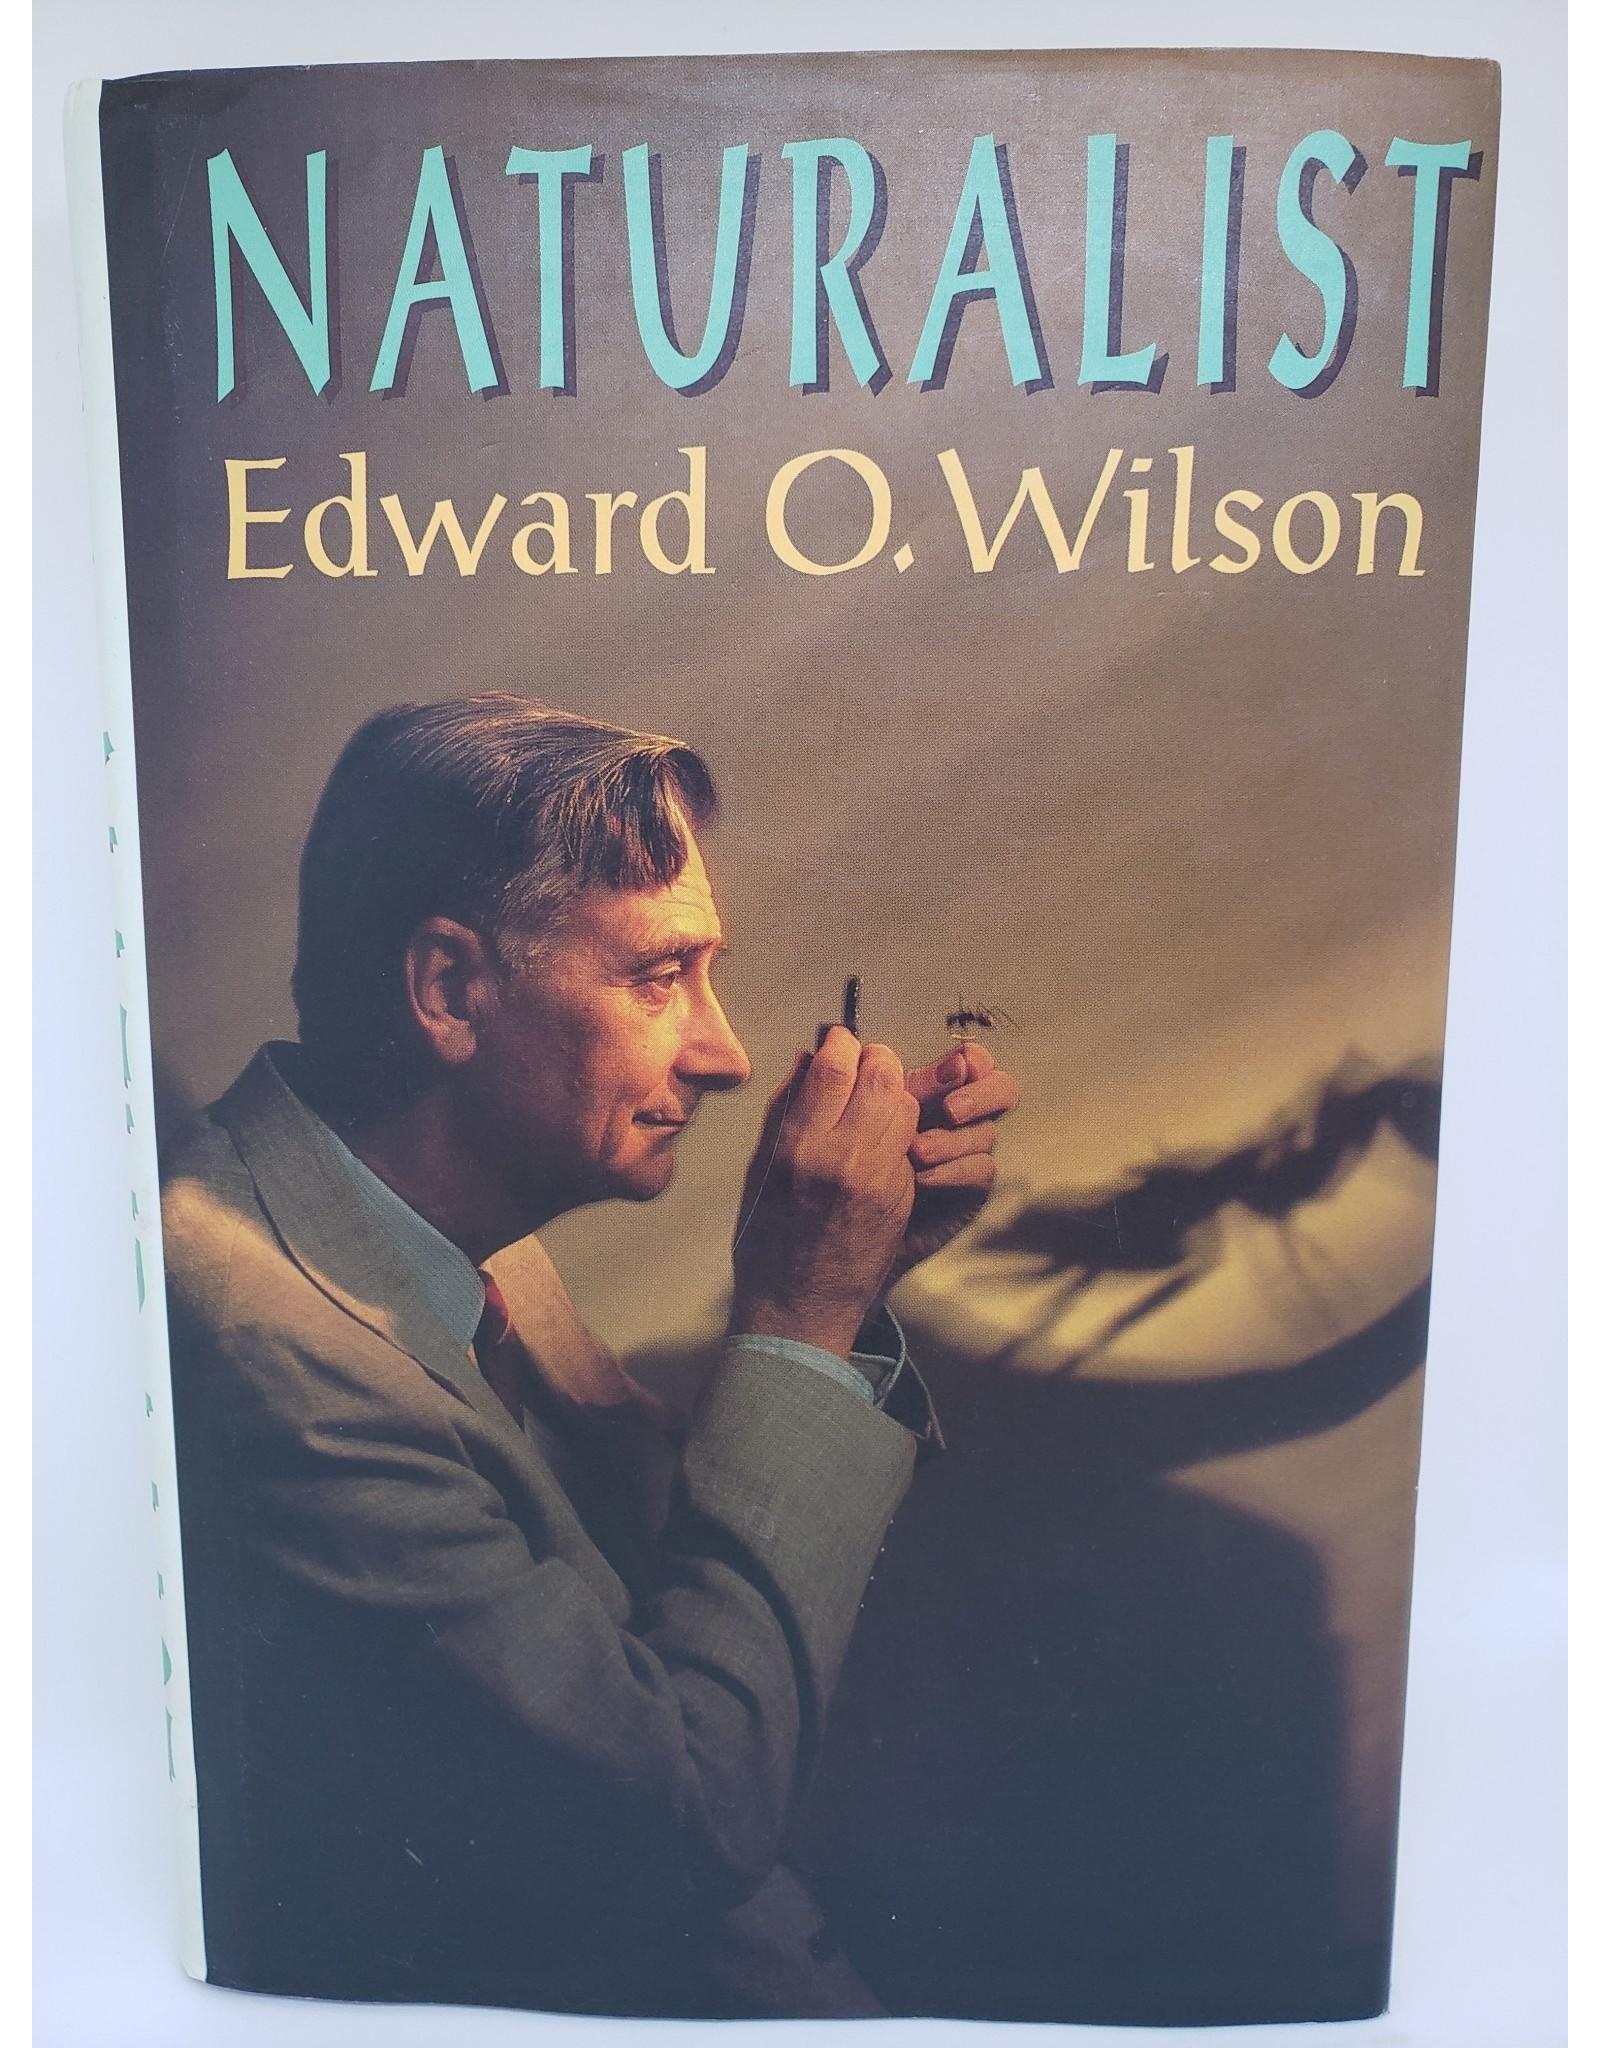 Angel Vaughan Naturalist